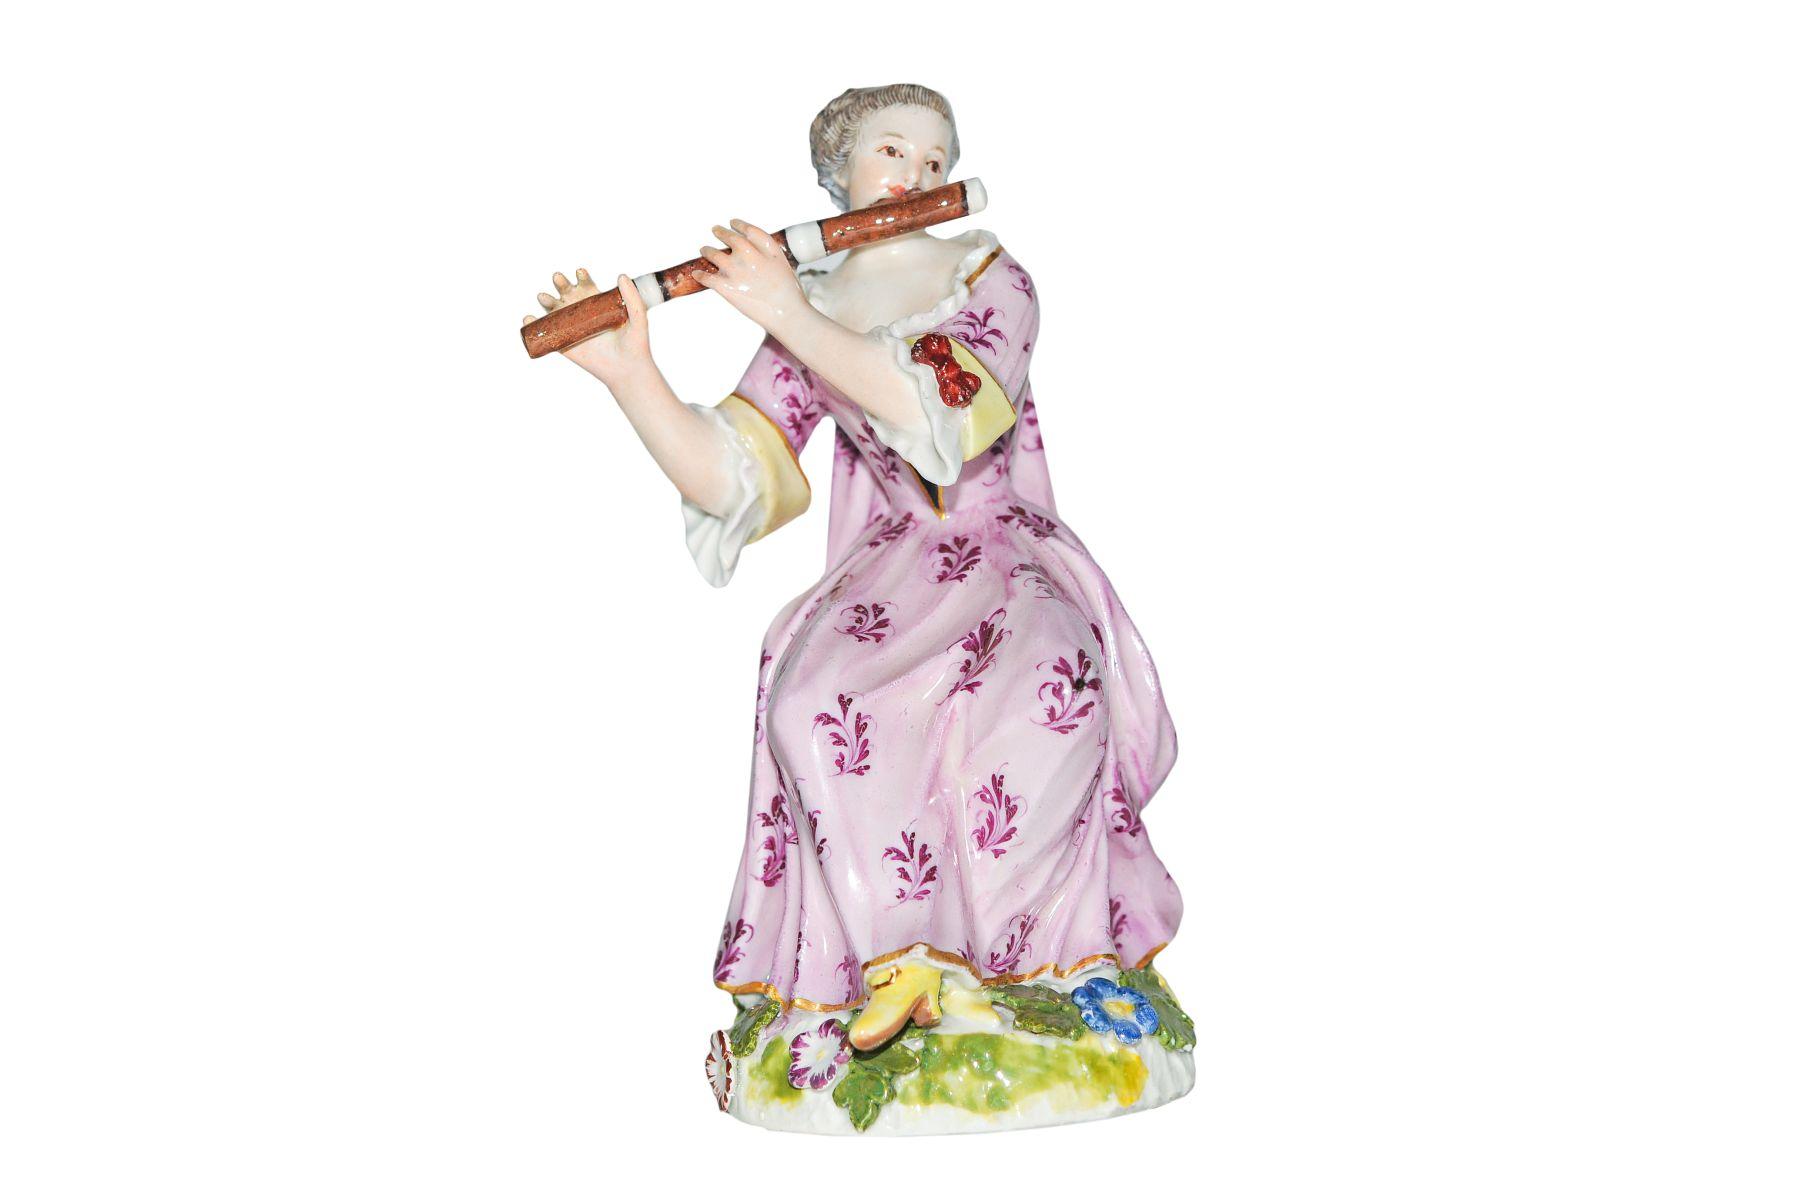 "#73 Flute player Meissen 1750 | Figur ""Flötenspielerin"" Meissen 1750 Image"